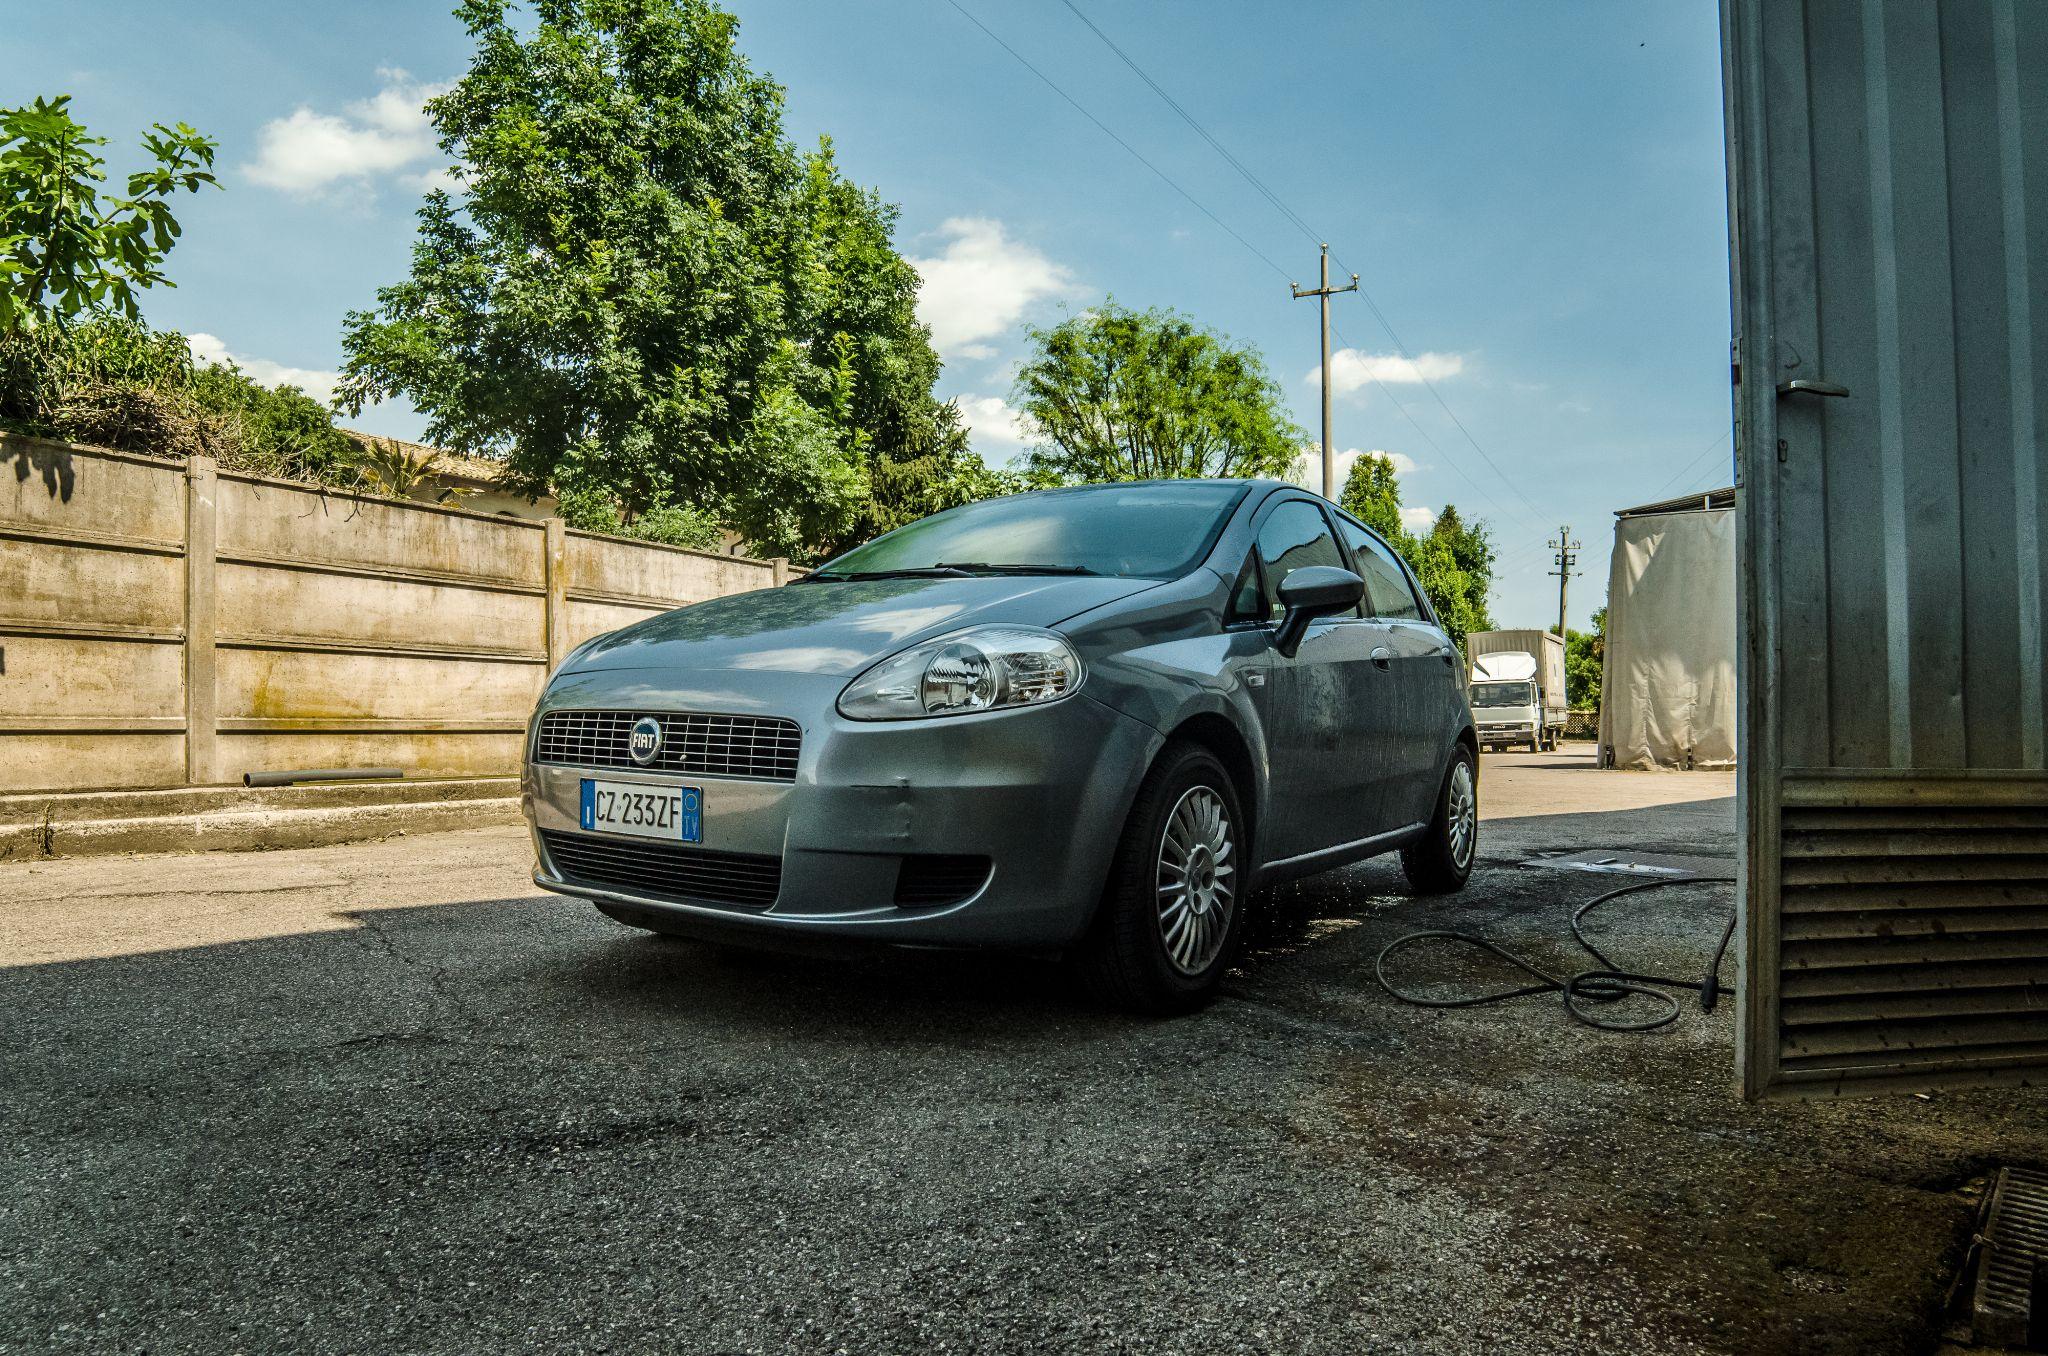 Car Wash by Col Guido